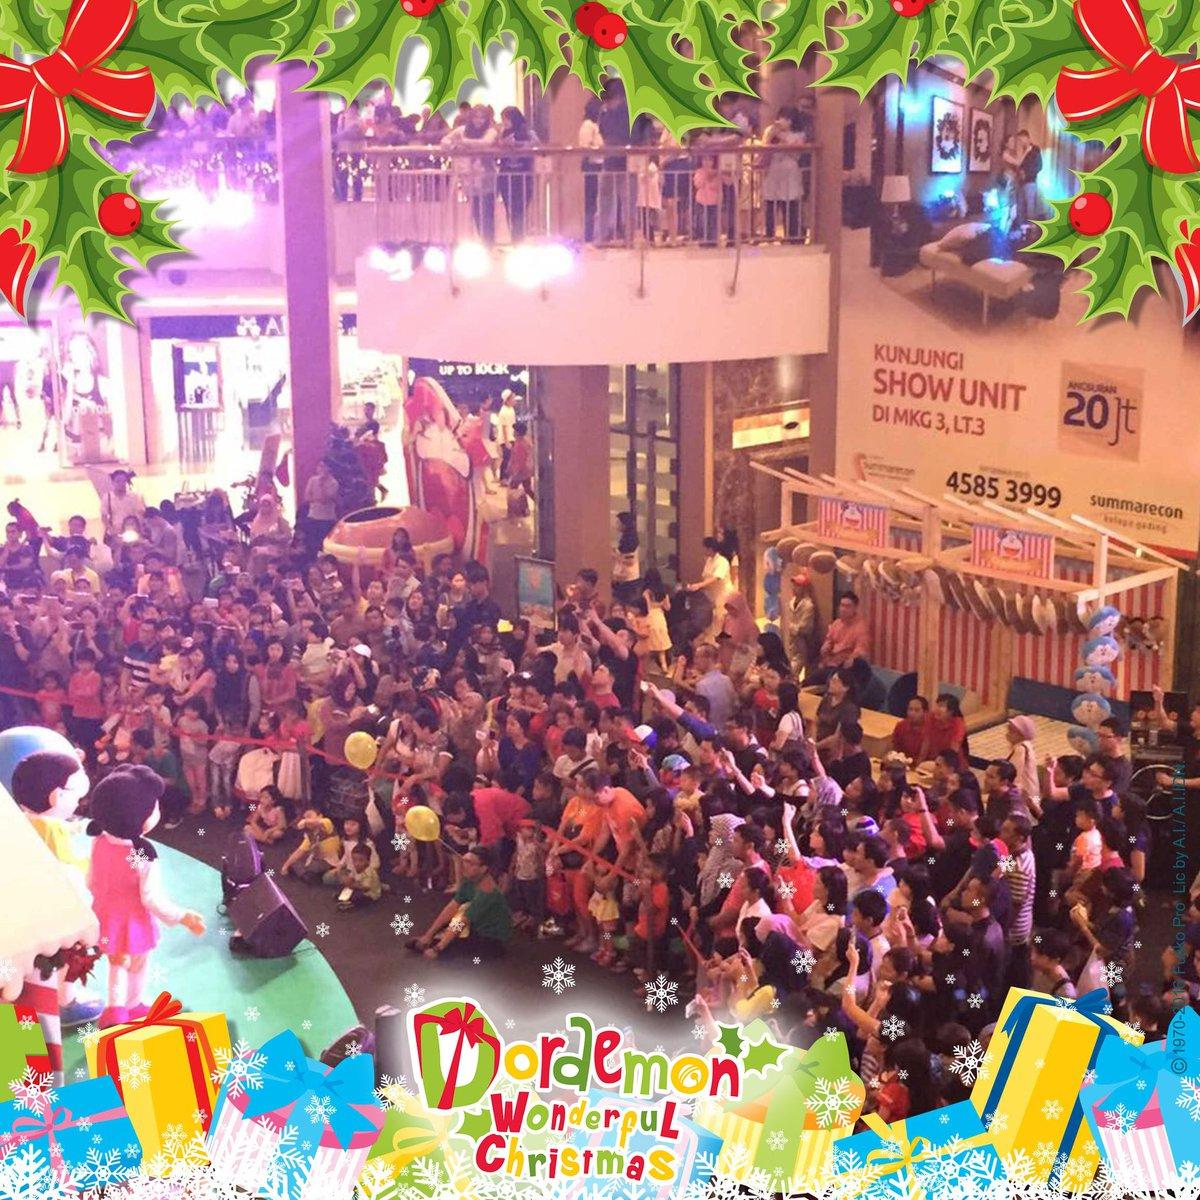 Yang ketinggalan Meet & Greet dengan Doraemon & Teman, jangan sedih! Masih ada 1 sesi terakhir pukul 7 PM.  Jangan lupa, hari ini terakhir! https://t.co/Z2IuNRxhkN